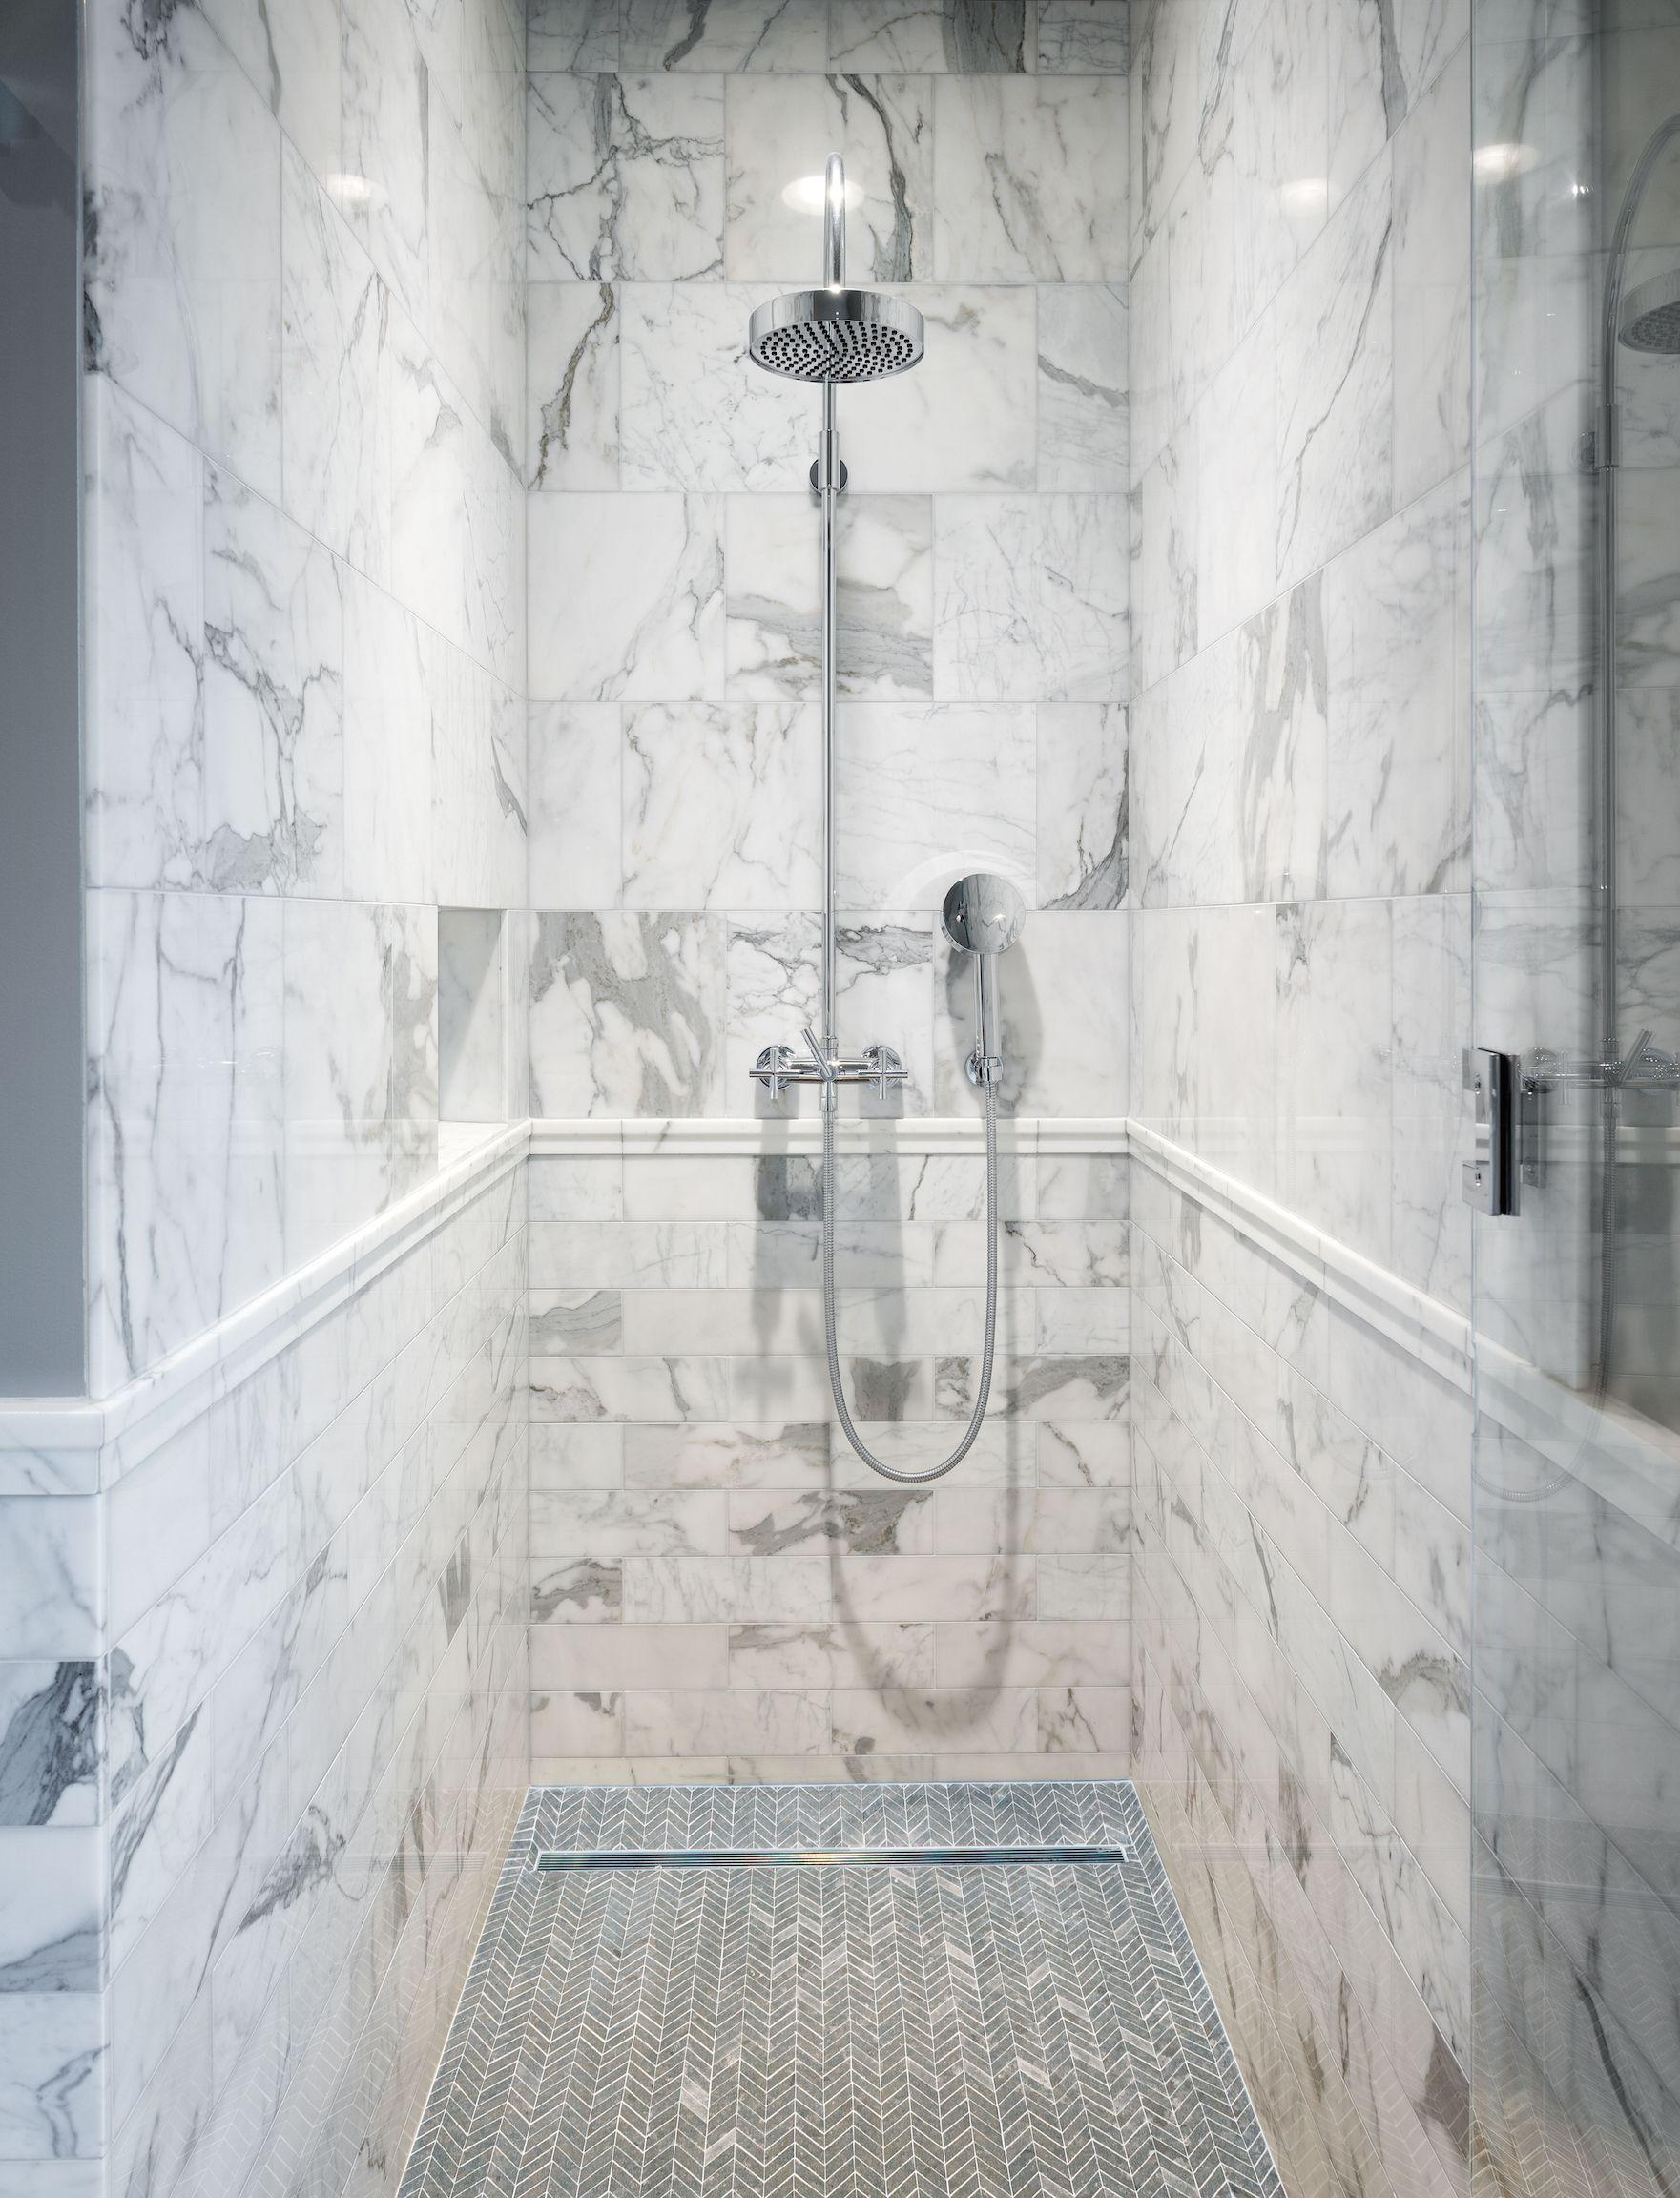 Boyu0027s Bathroom Shower, Seattle WA, Statuary Carrara Marble, Wainscoting,  Herringbone Shower Floor Pan, Dornbracht Plumbing, Interior Design By Dixie  Stark ...